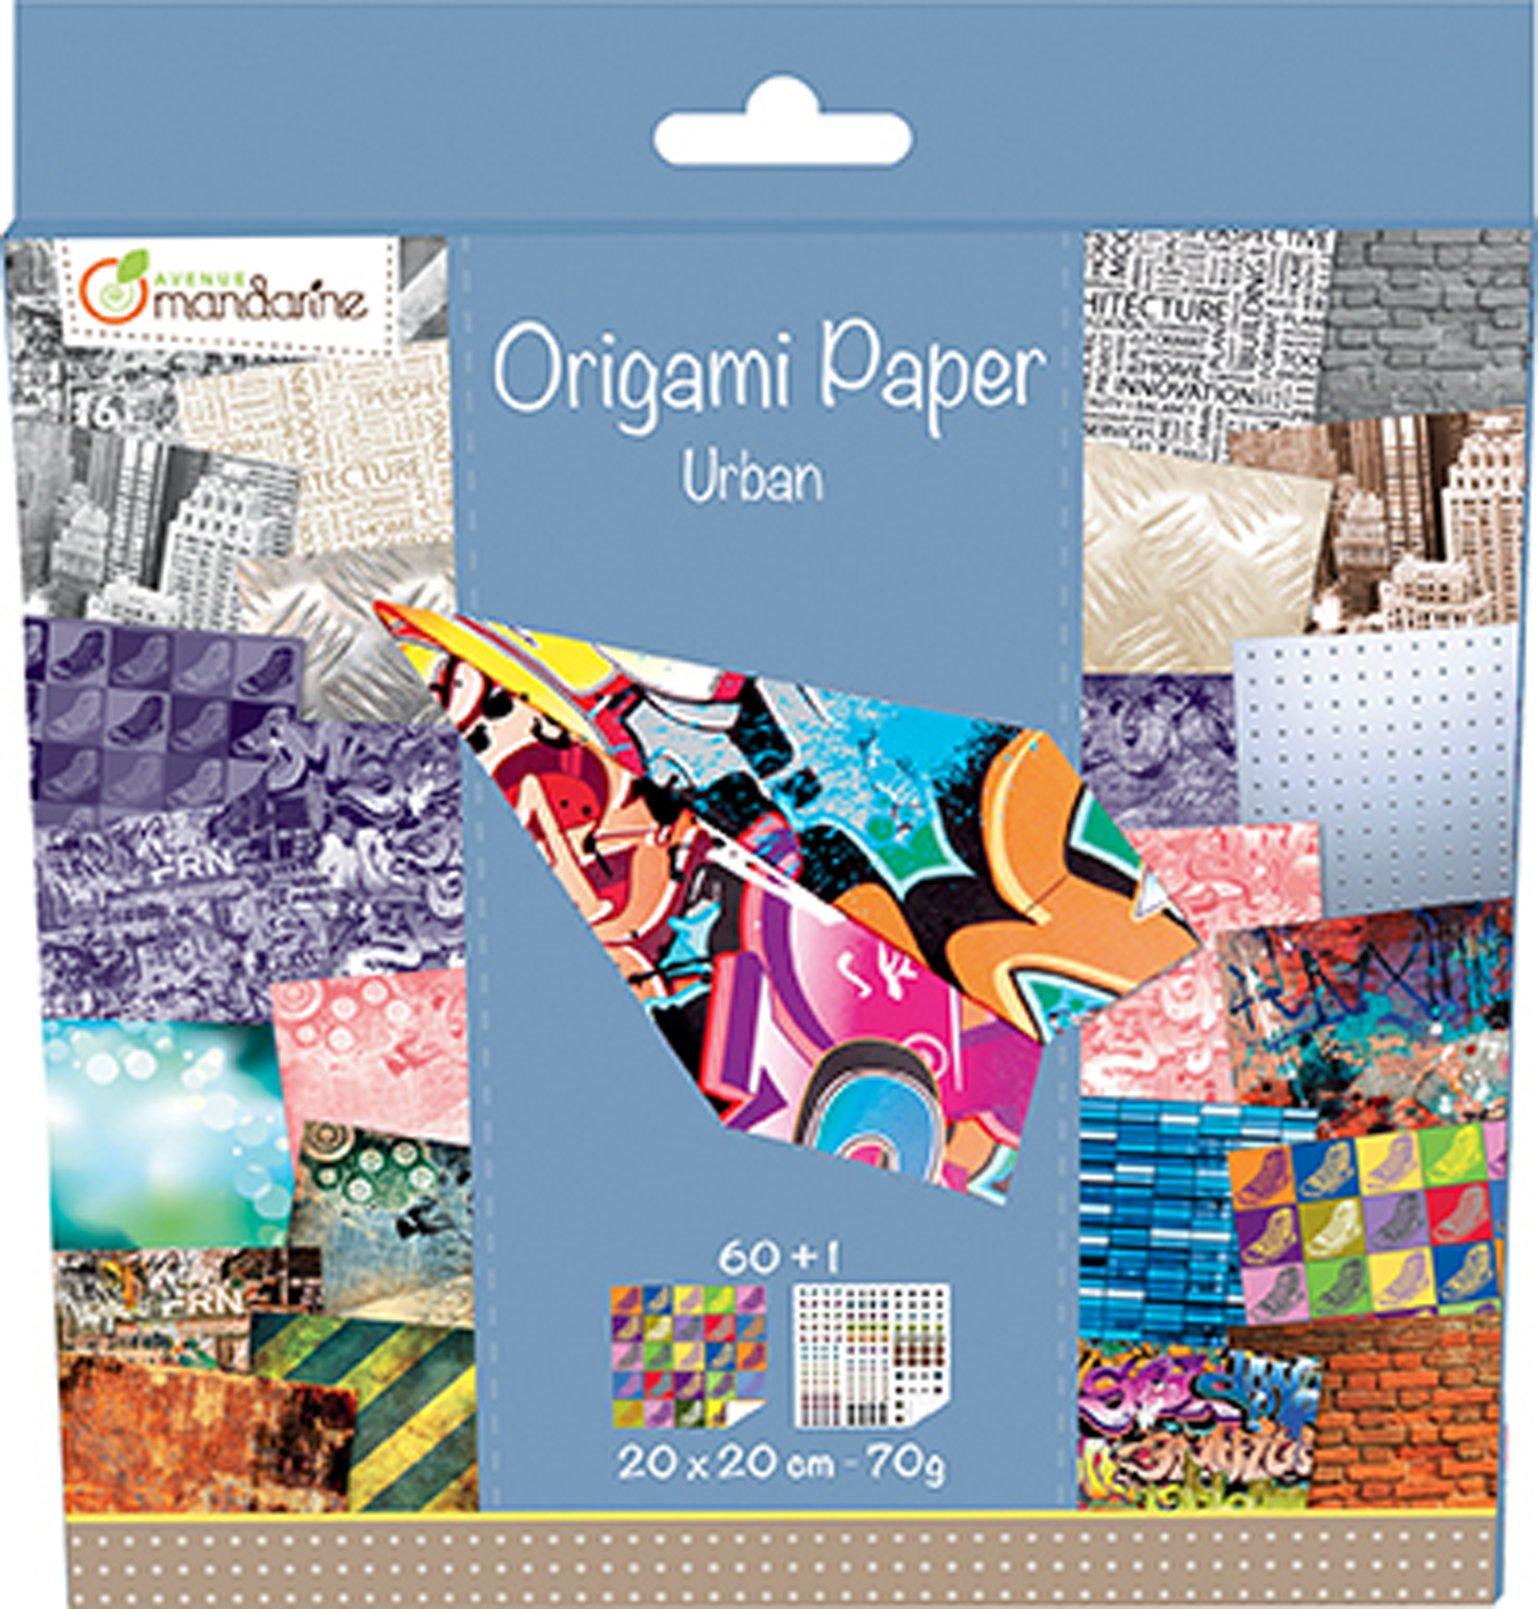 Origami Paper 17cm x 17cm Singapore | MTRADE Novelty Wholesale | 1609x1538